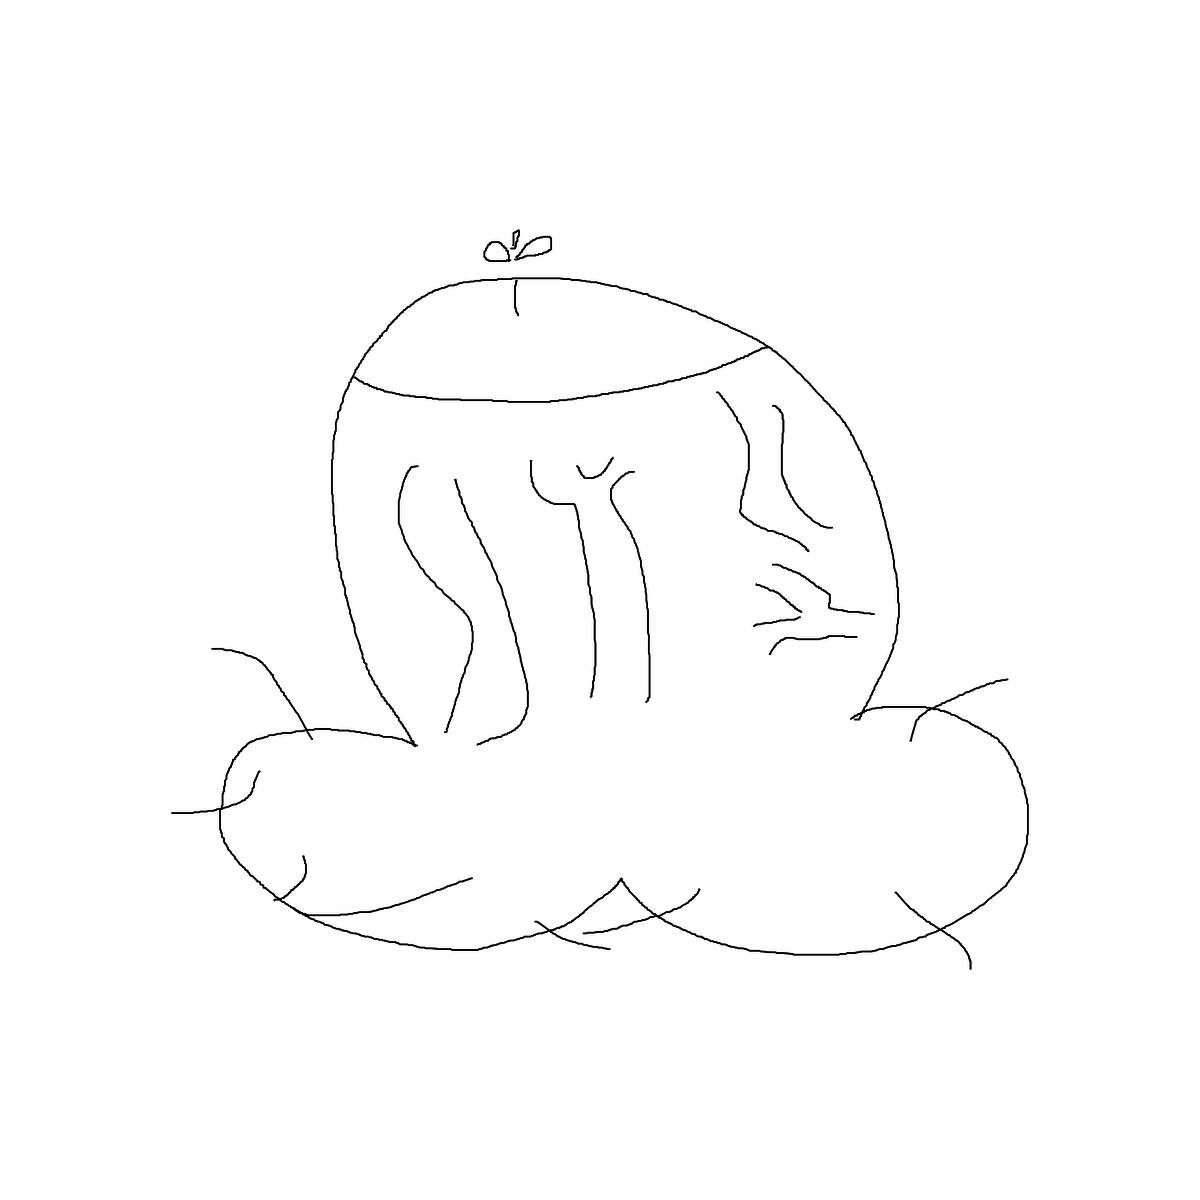 BAAAM drawing#1708 lat:54.4778785705566400lng: -3.5315001010894775